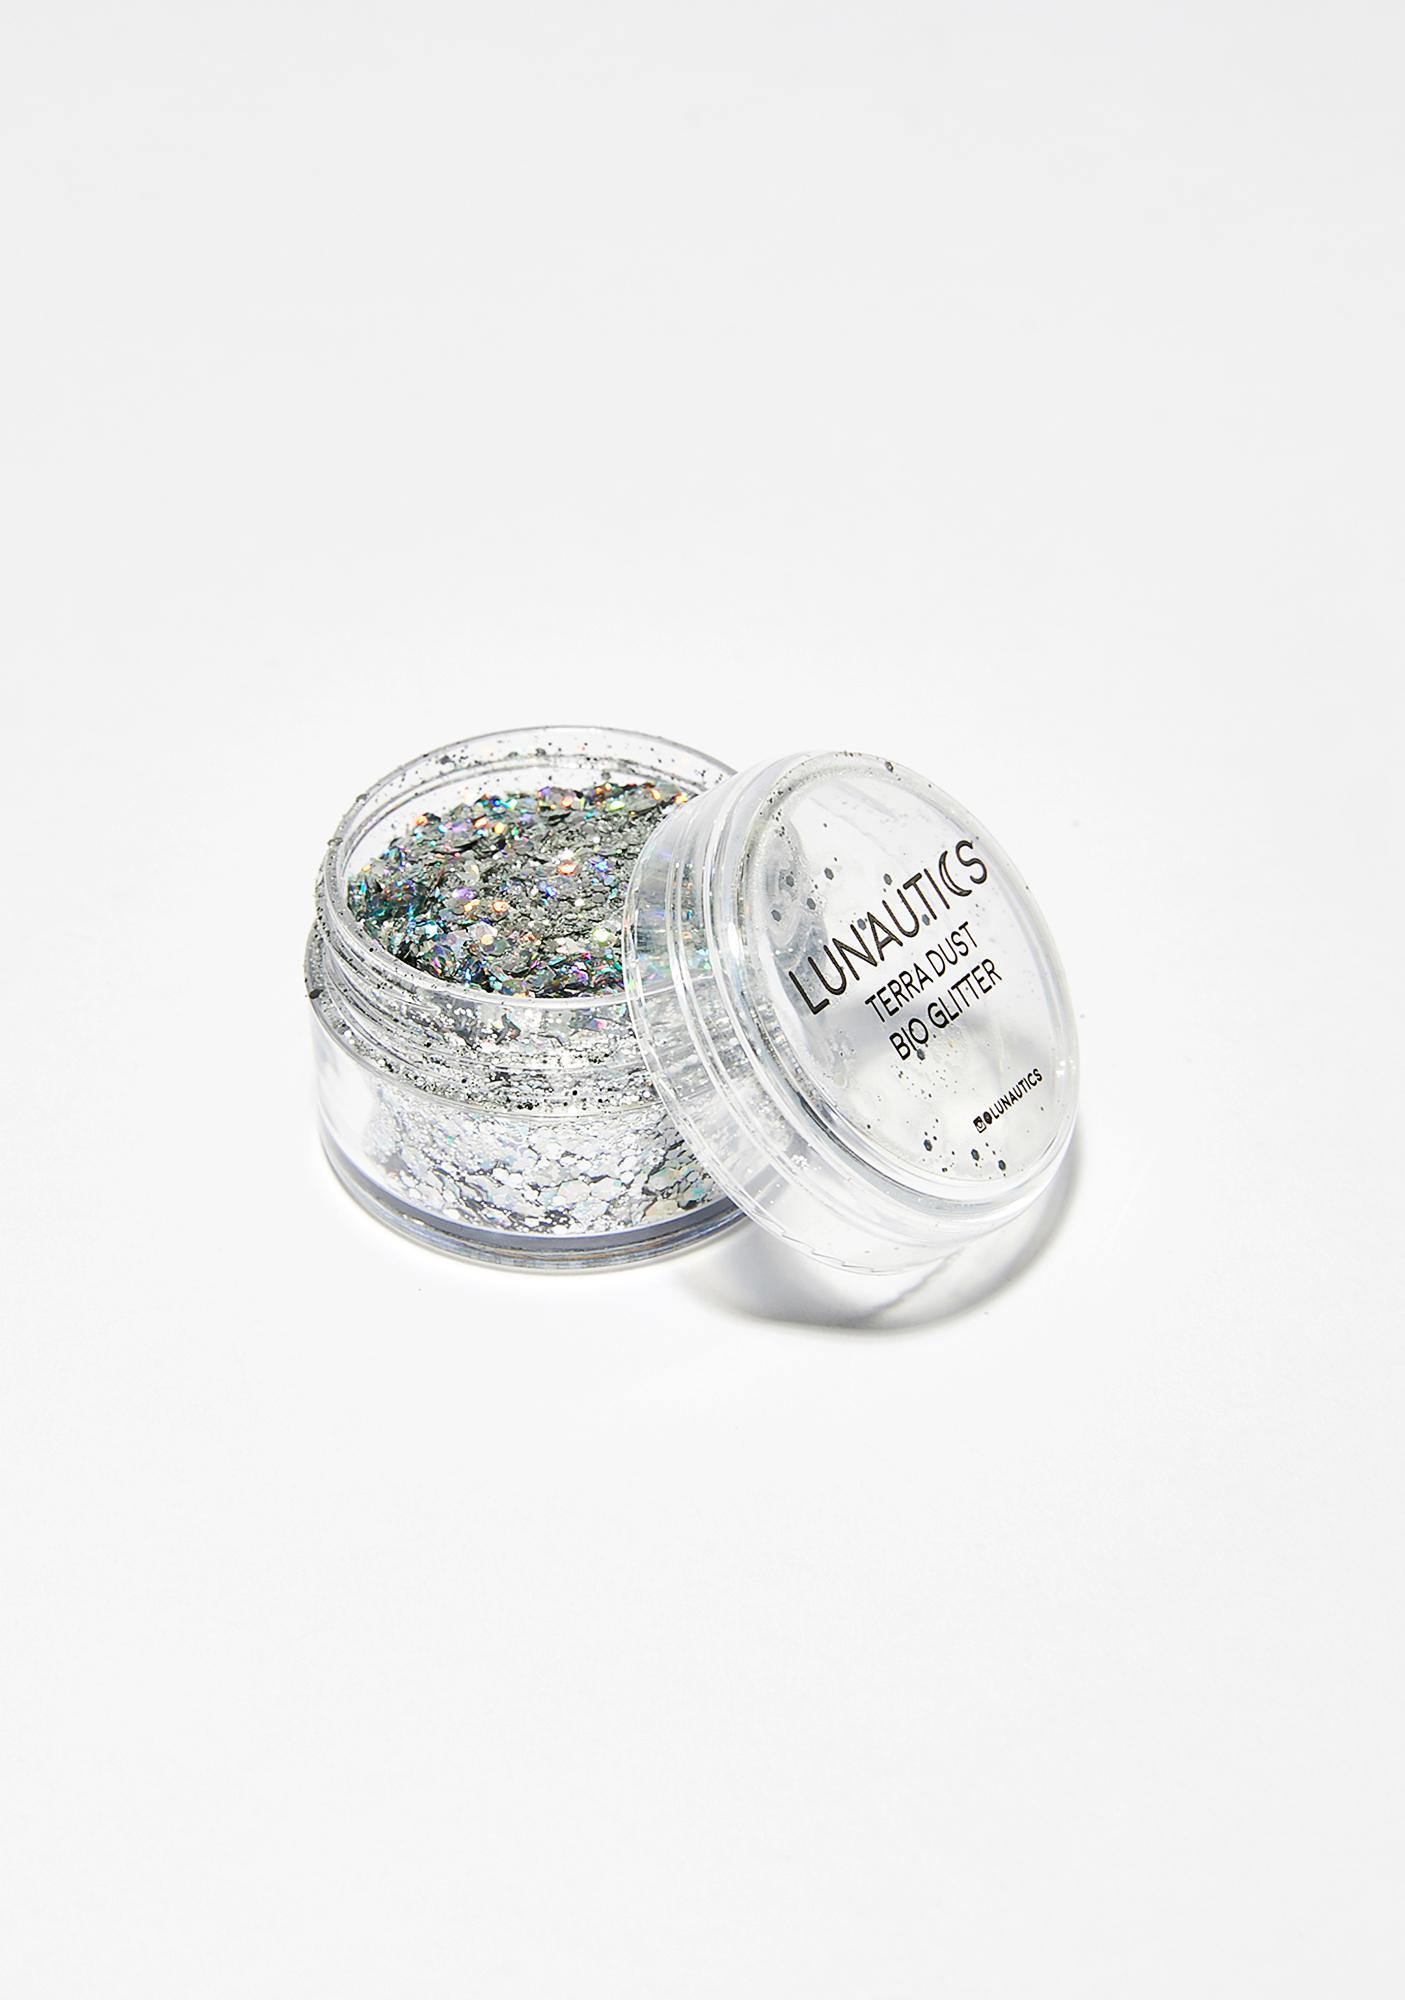 Lunautics Sterling Terra Dust Biodegradable Glitter